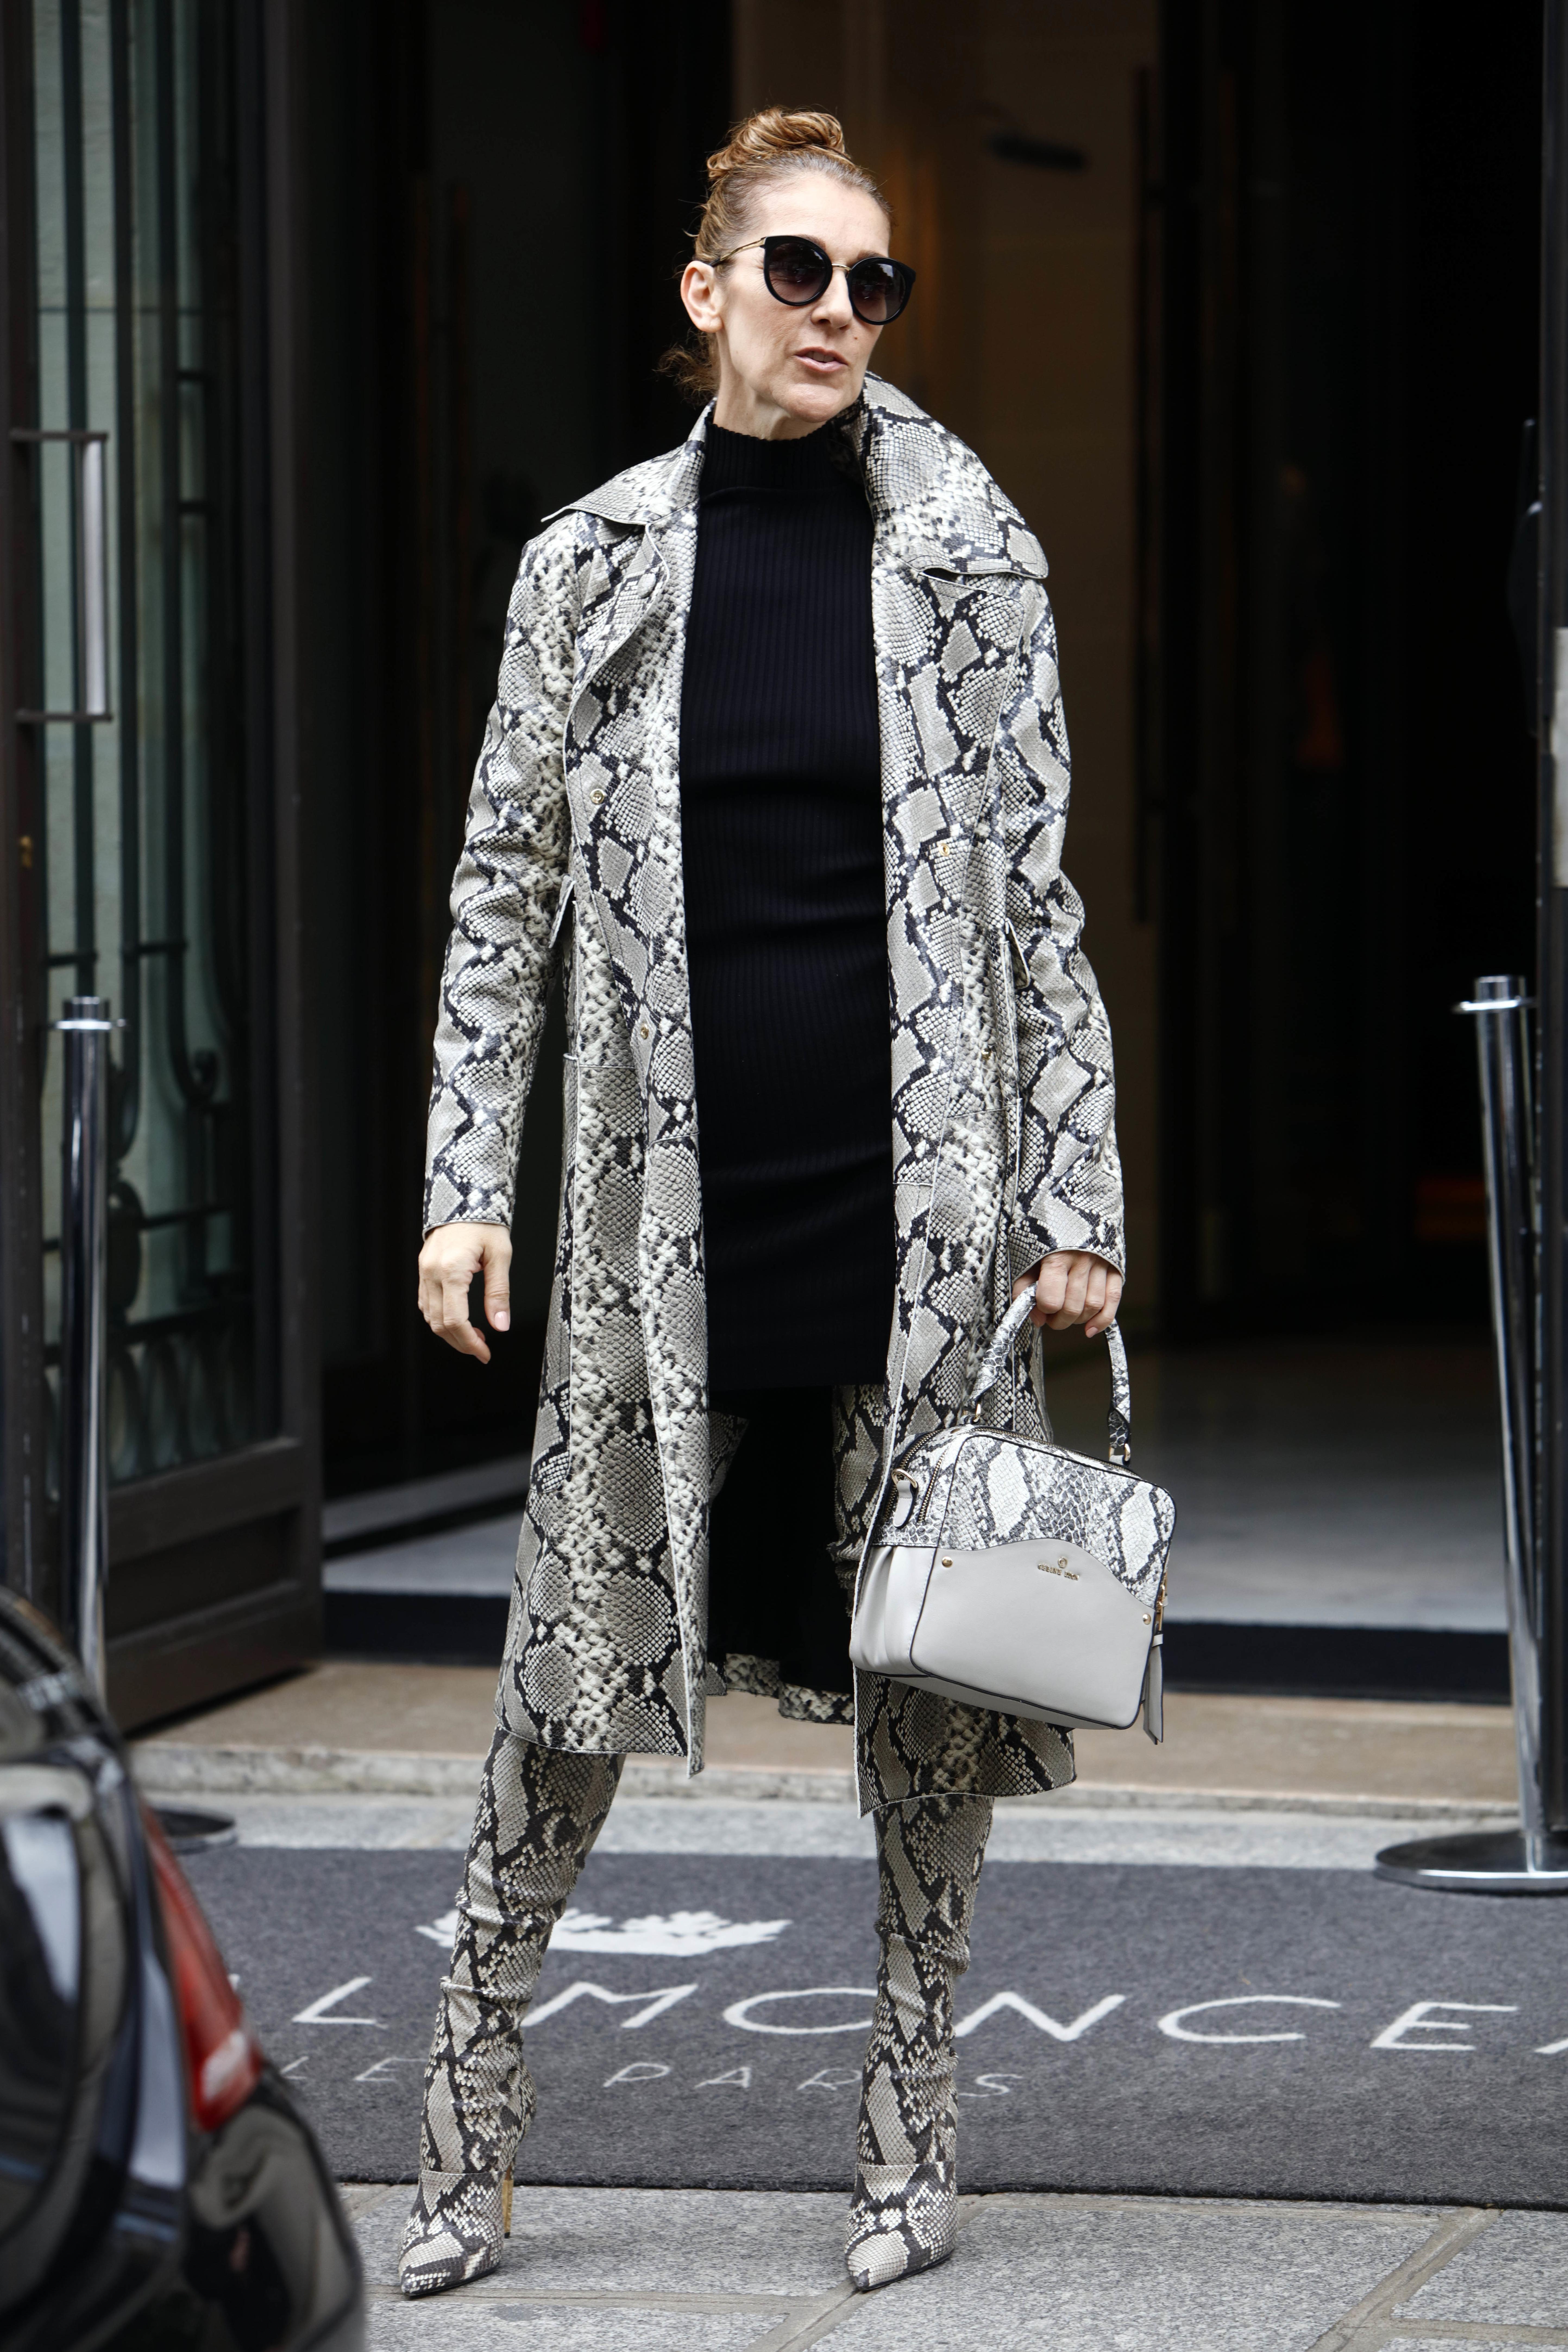 98f17e6c7270 Celine Dion s complete style transformation - AOL Lifestyle